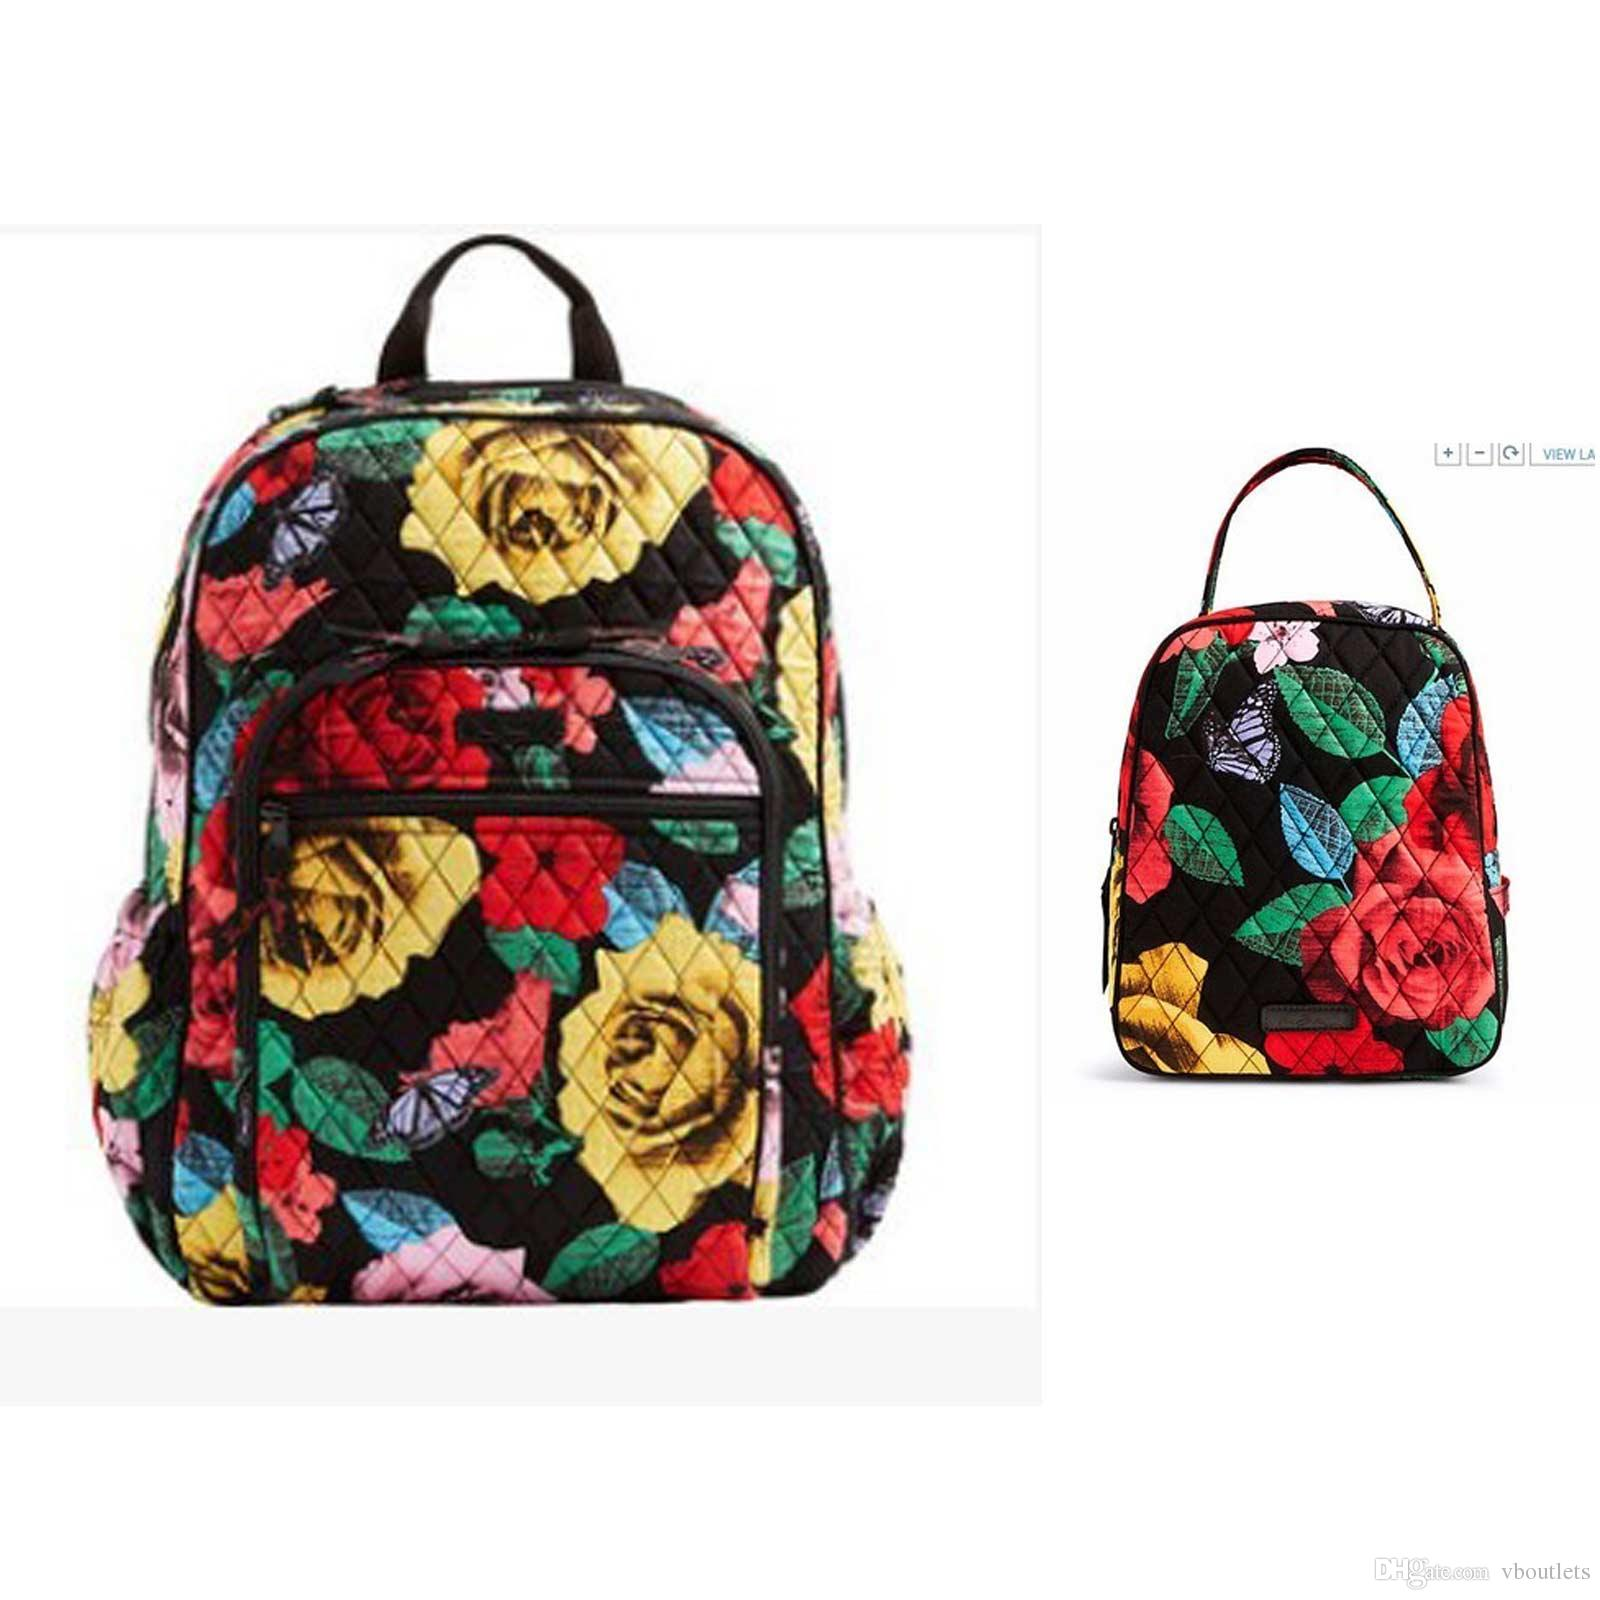 Campus tecnologia mochila laptop Campus Laptop Bag Mochila Escolar com o saco de almoço